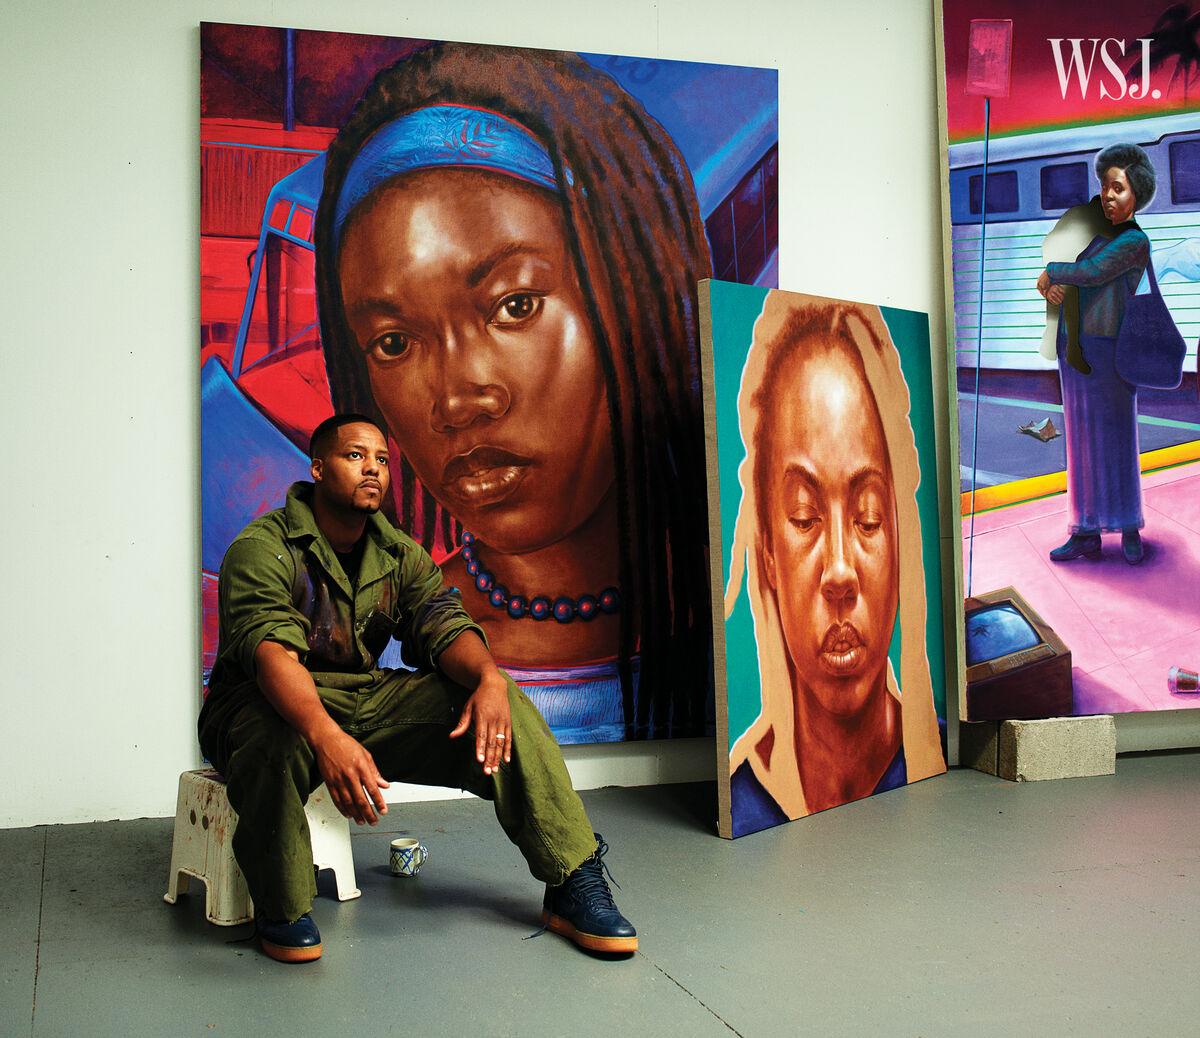 Portrait of Titus Kaphar in his studio. Courtesy Mario Sorrenti for WSJ. Magazine.